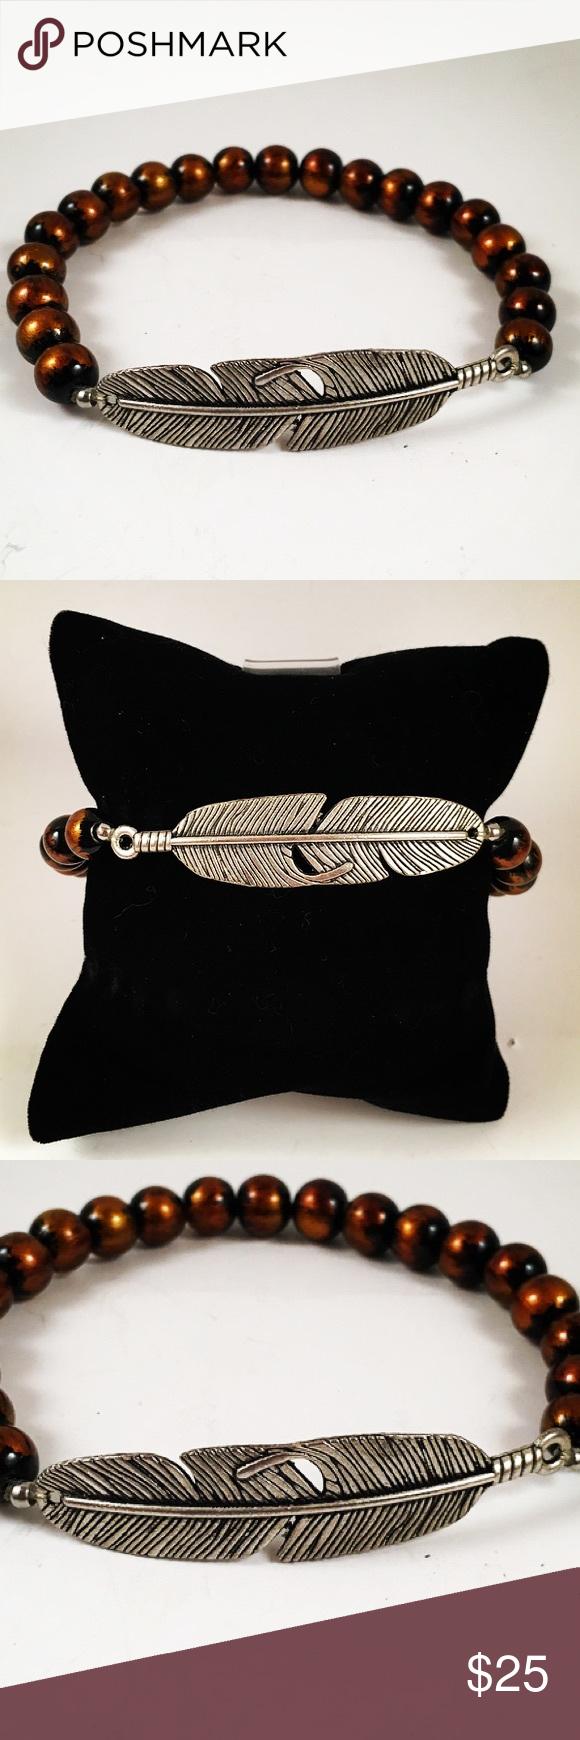 Men orange and black beaded feather bracelet boutique men bead